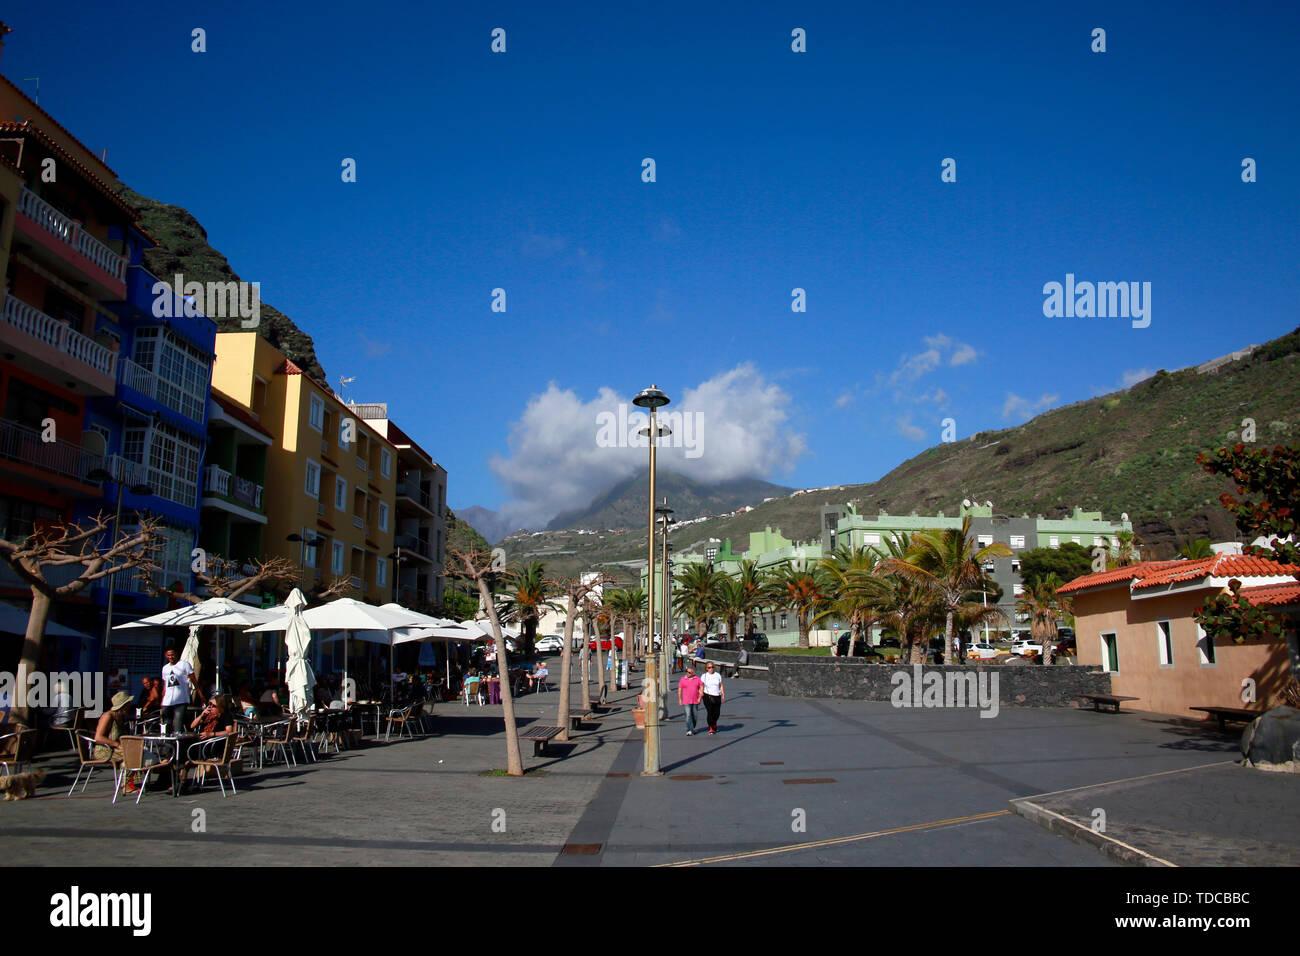 Strand in Puerto de Tazacorte, La Palma, Kanarische Inseln, Spanien Stock Photo